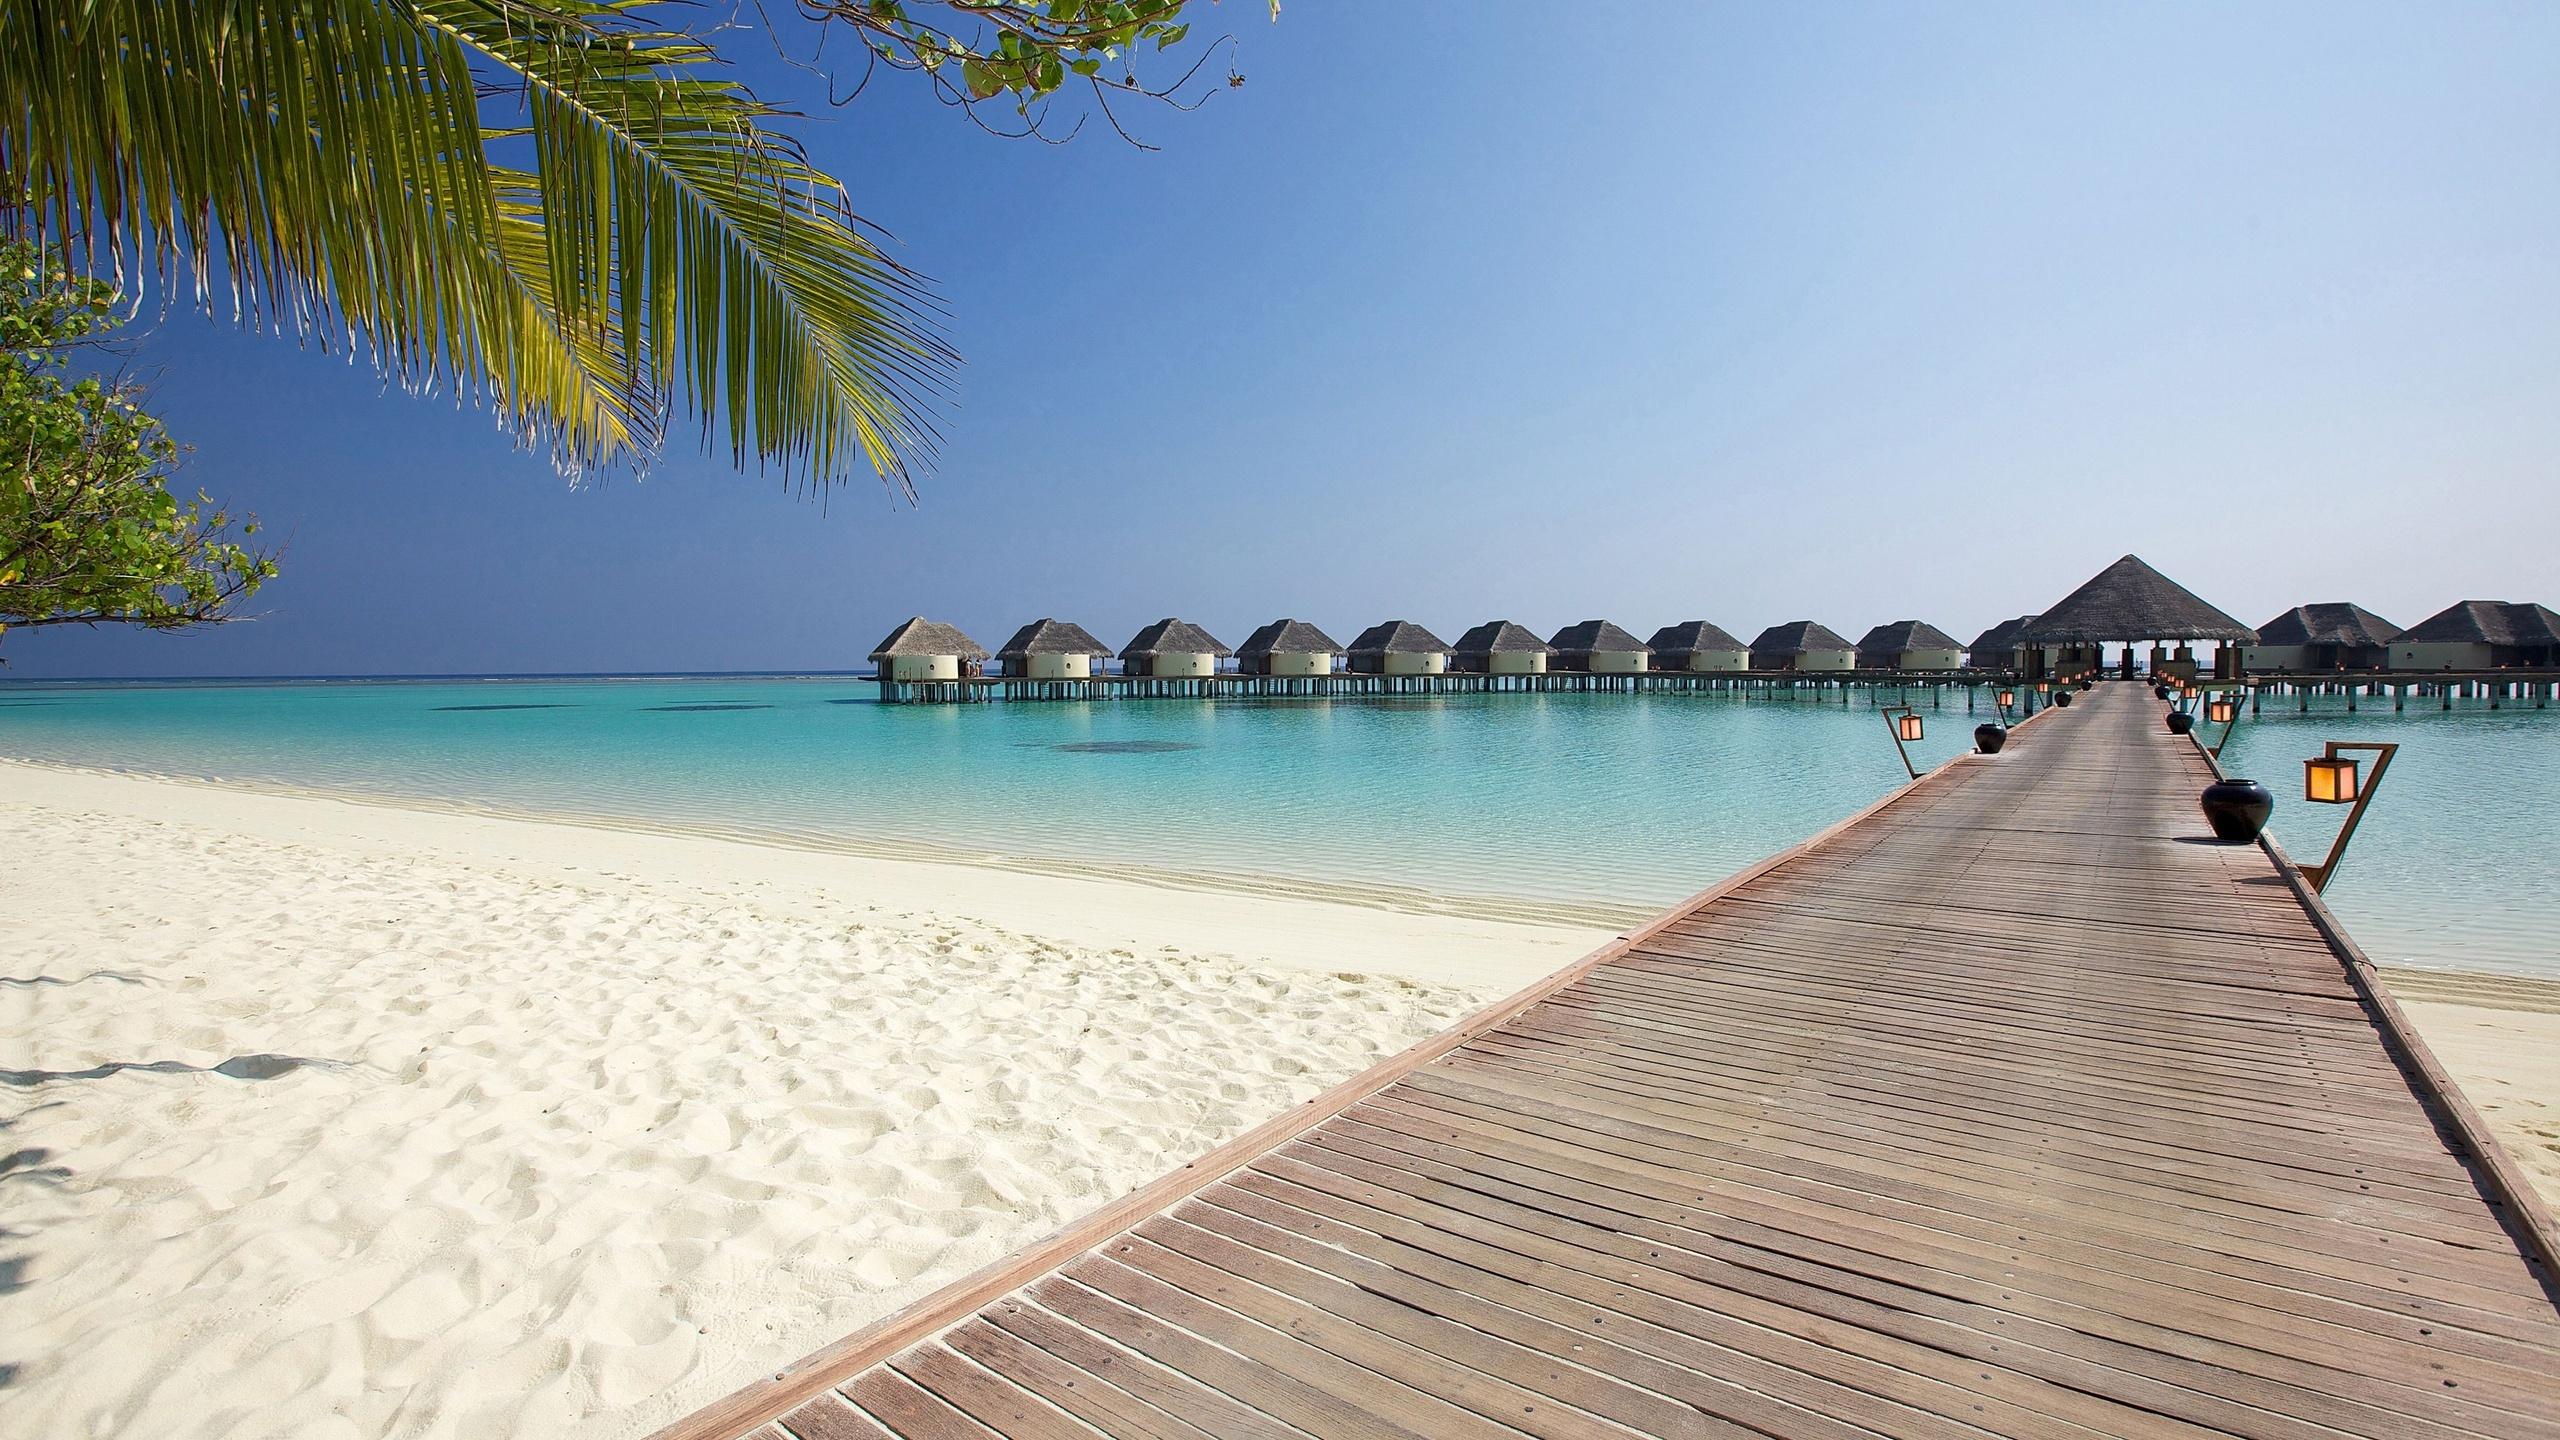 Vabbinfaru Island, Maldives  № 1471600 загрузить